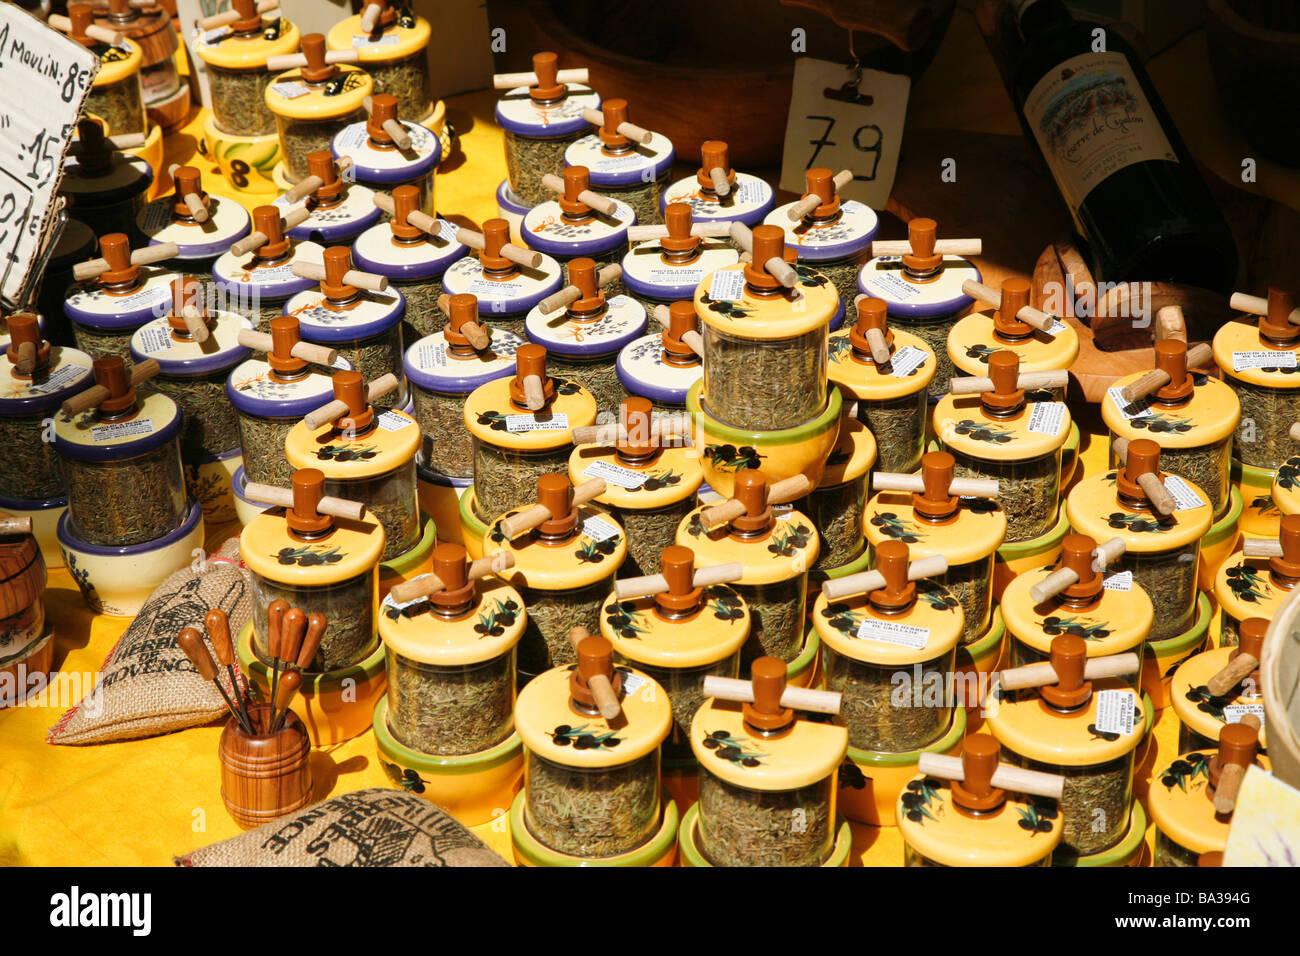 Herb de Provence for Sale in Saint Tropez - Stock Image